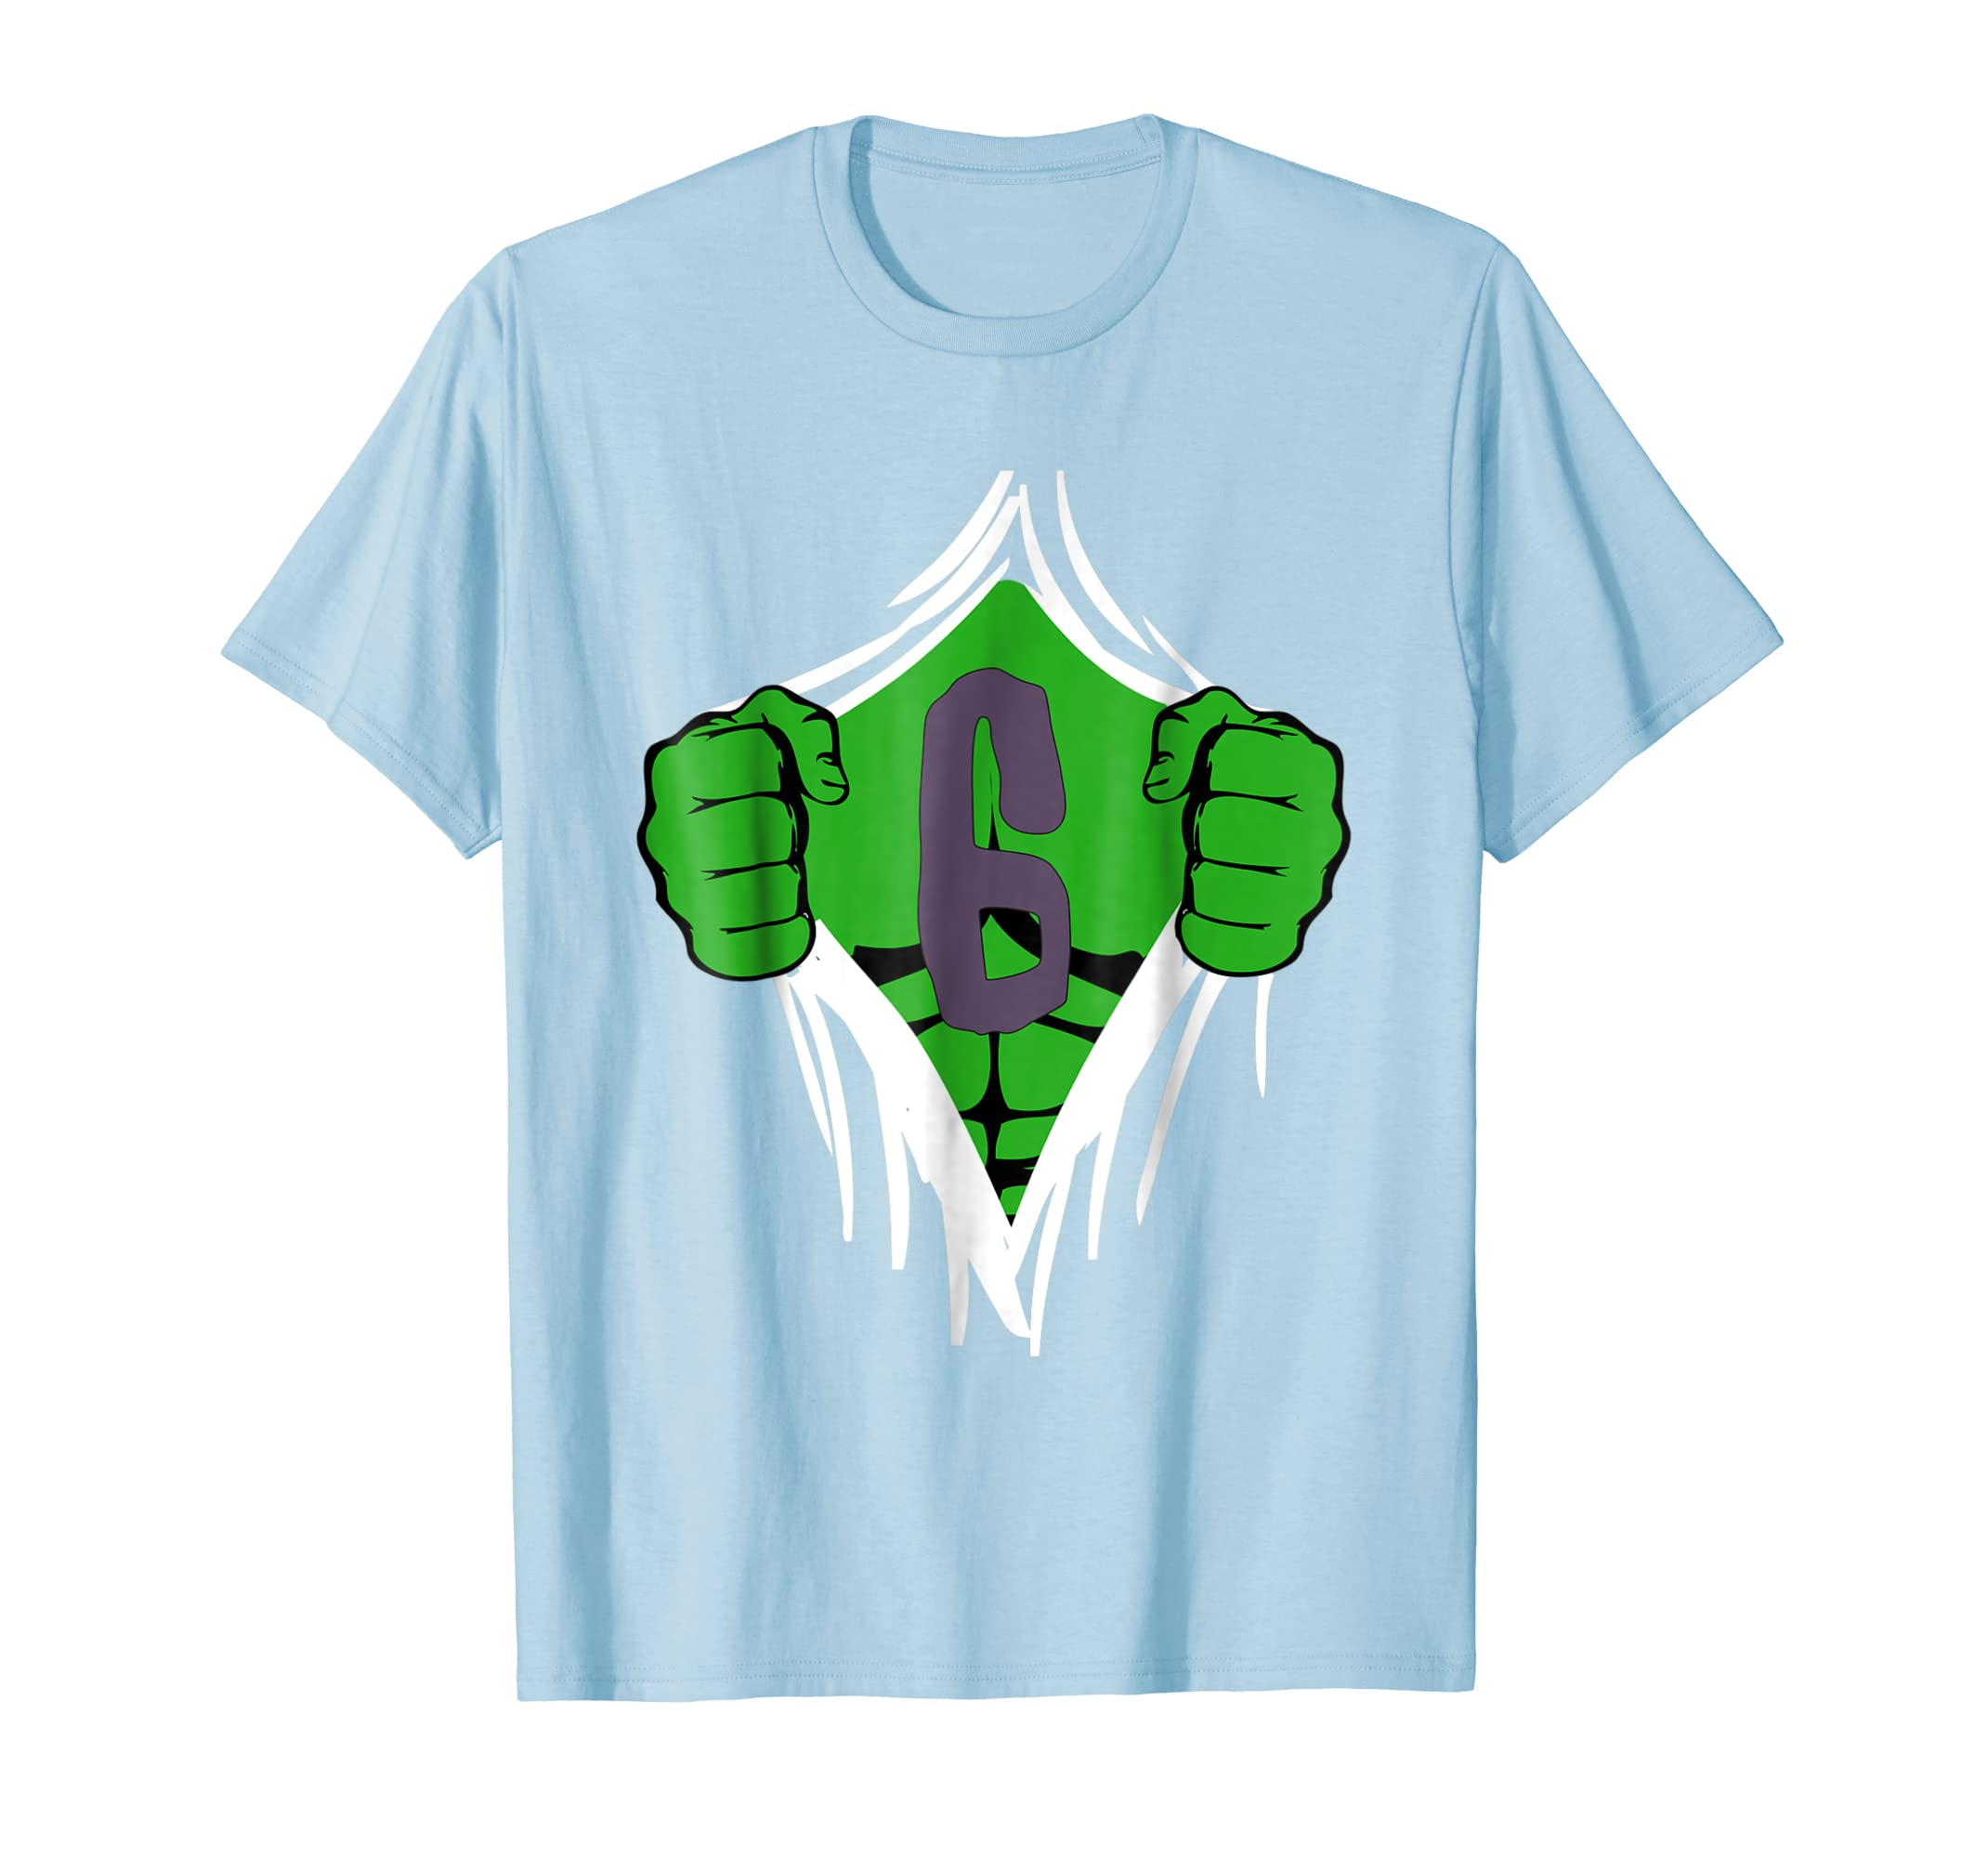 Green Man Chest Superhero Birthday Shirt For 6 Year Old Boys